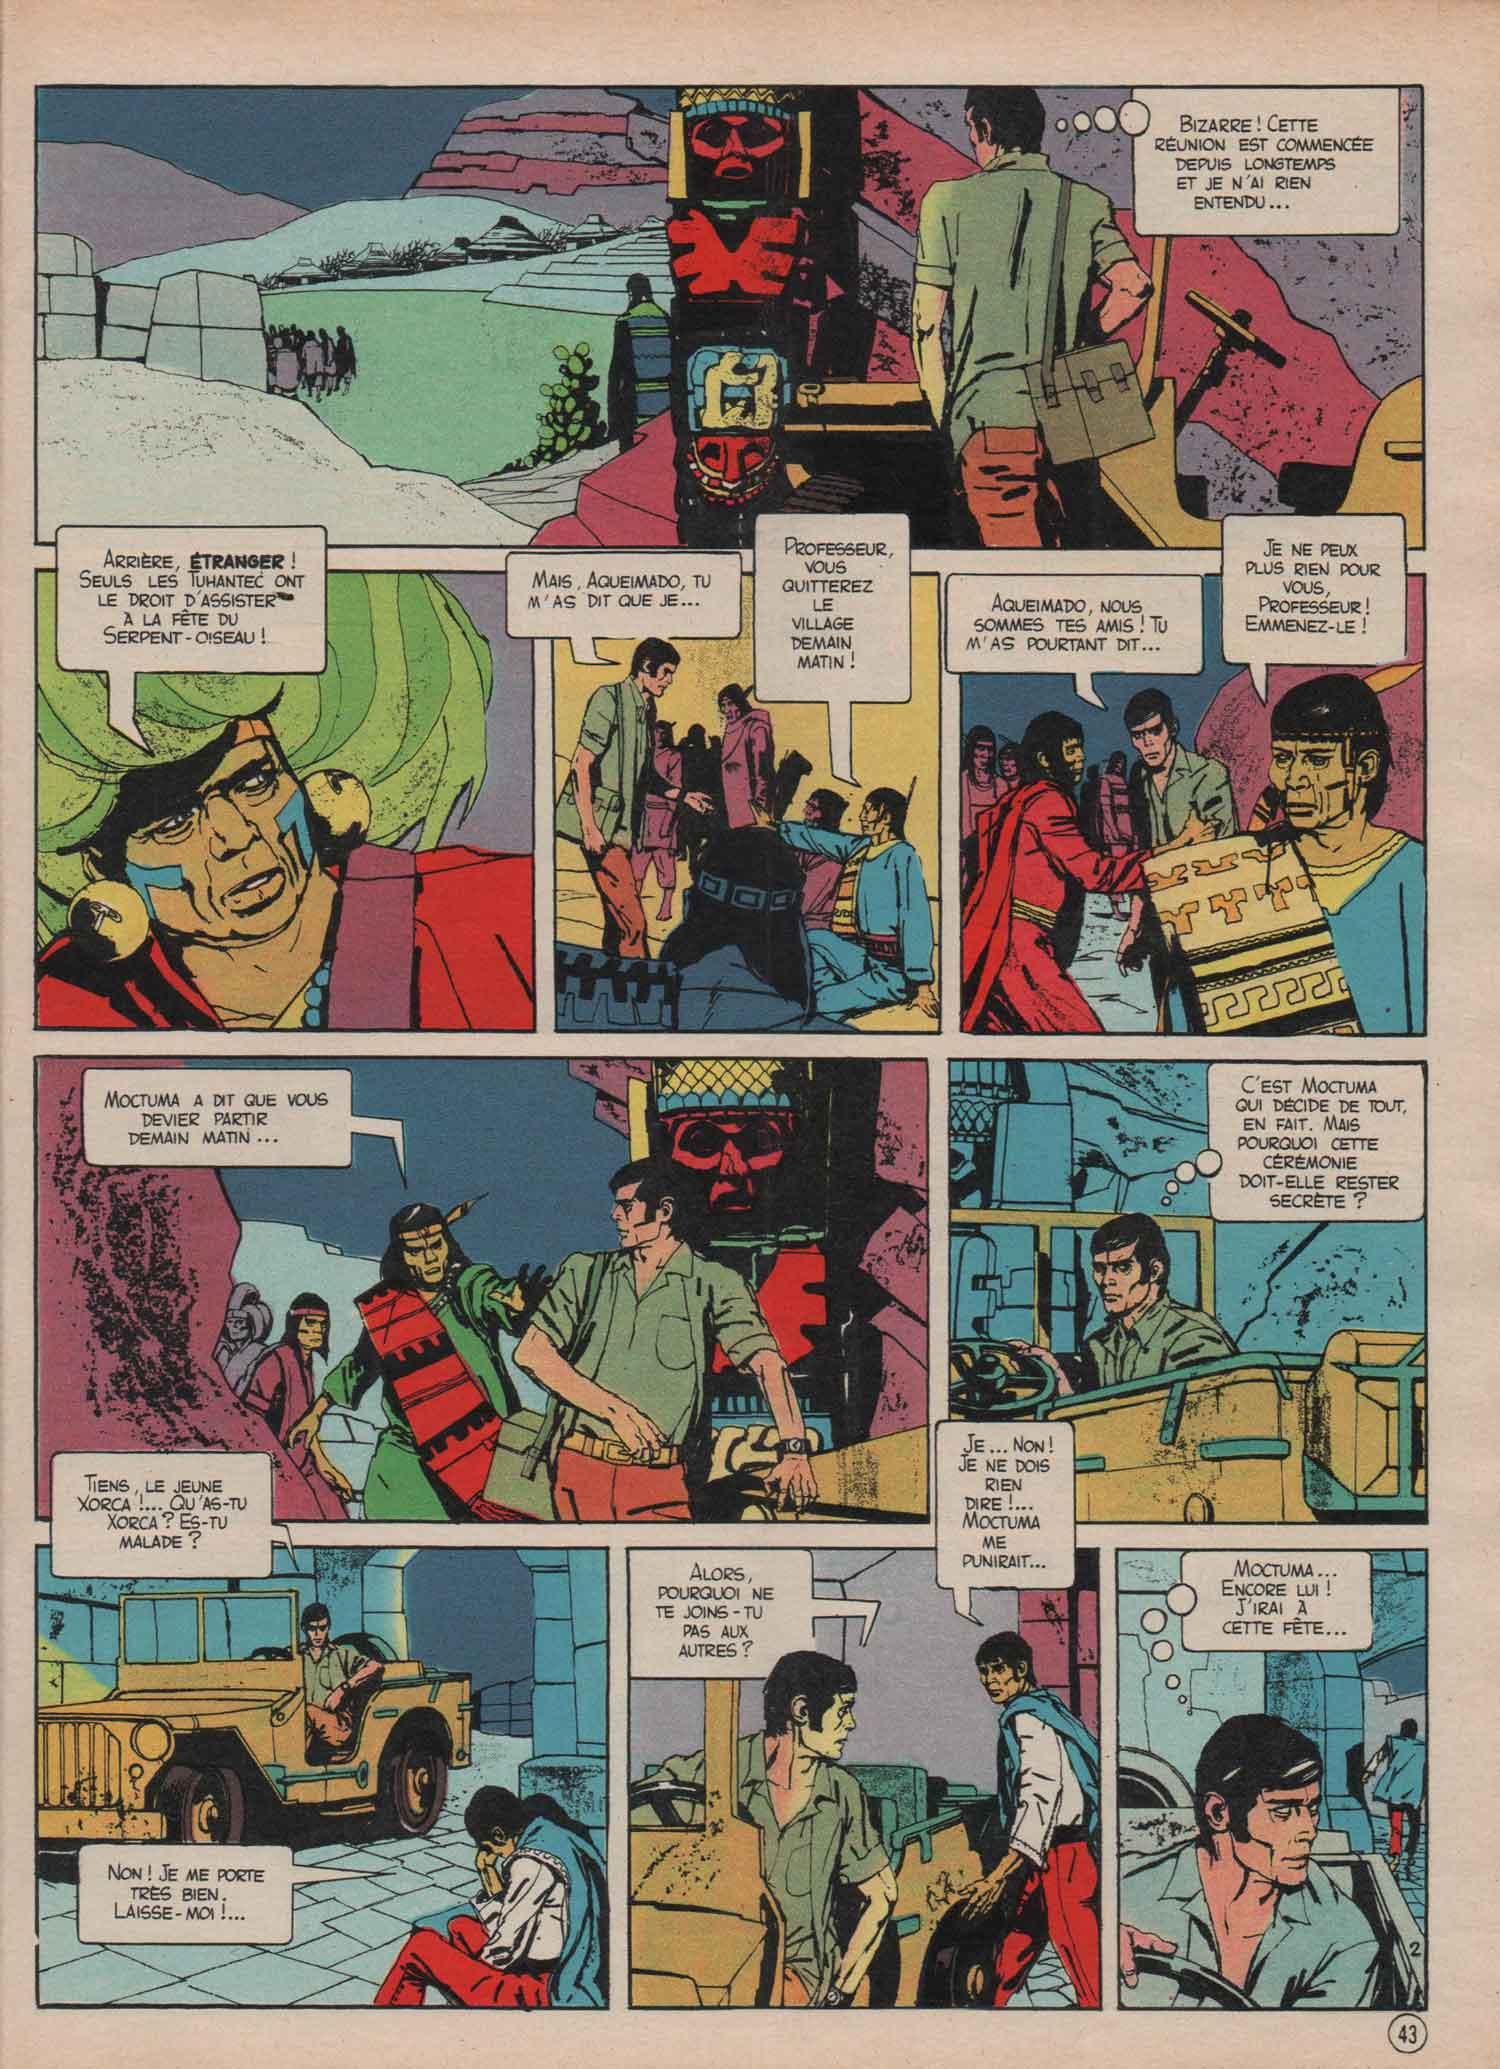 « Professeur Flamand » dans Le Journal de Mickey n° 1175 (12/12/74).